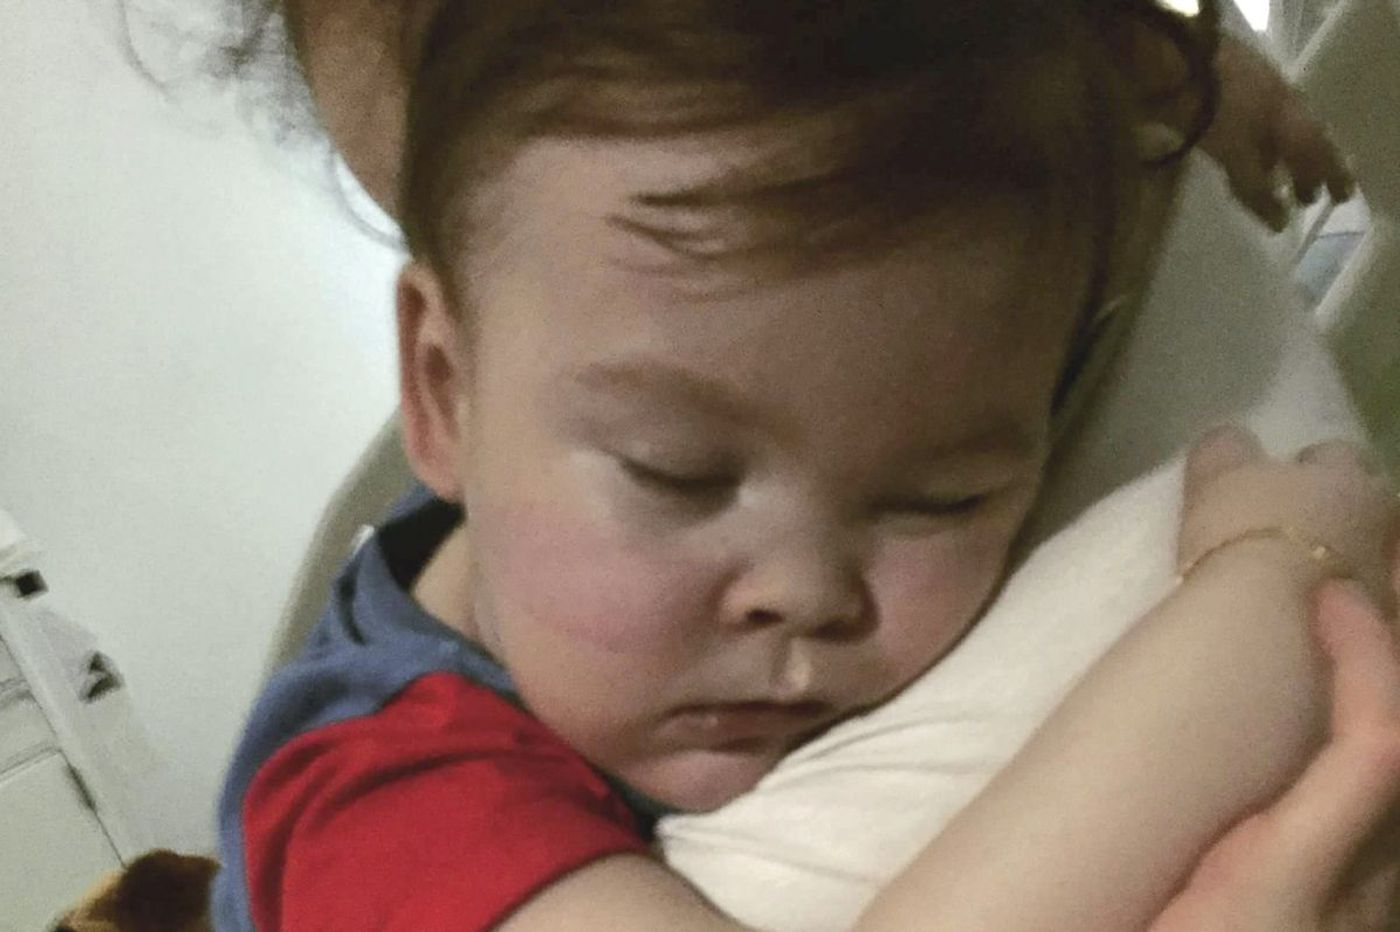 British toddler Alfie Evans' sad story makes me grateful for Pa.'s Down syndrome legislation | Christine Flowers